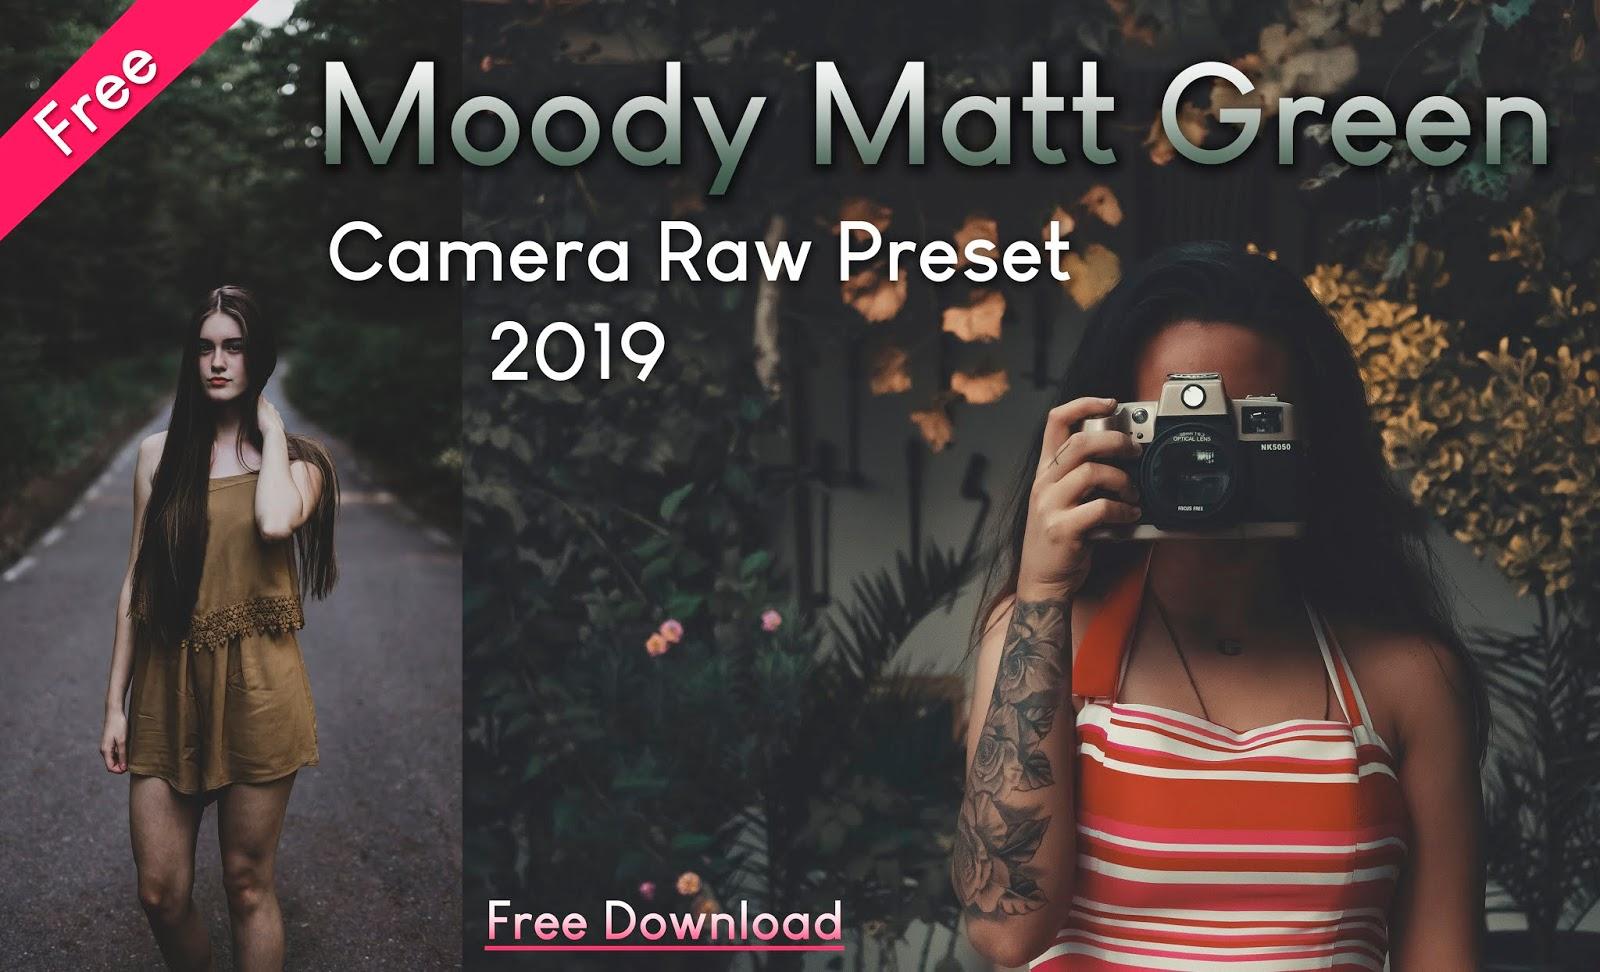 Download Free Moody Matt Green Camera Raw Preset of 2020